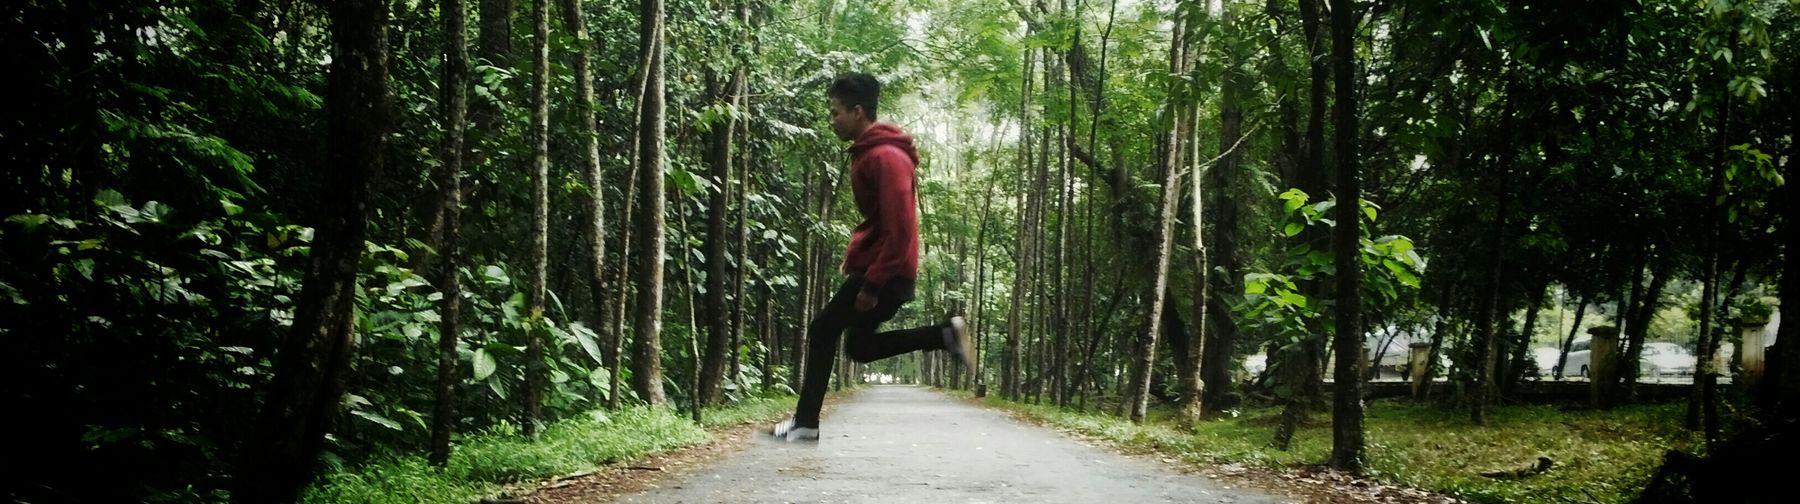 Ceritalevitasi Letivate Jumpfly VSCO Cam Vansshoes Sk8hi Explorepontianak Lingkarindonesia Exploreborneo Vans Shoes